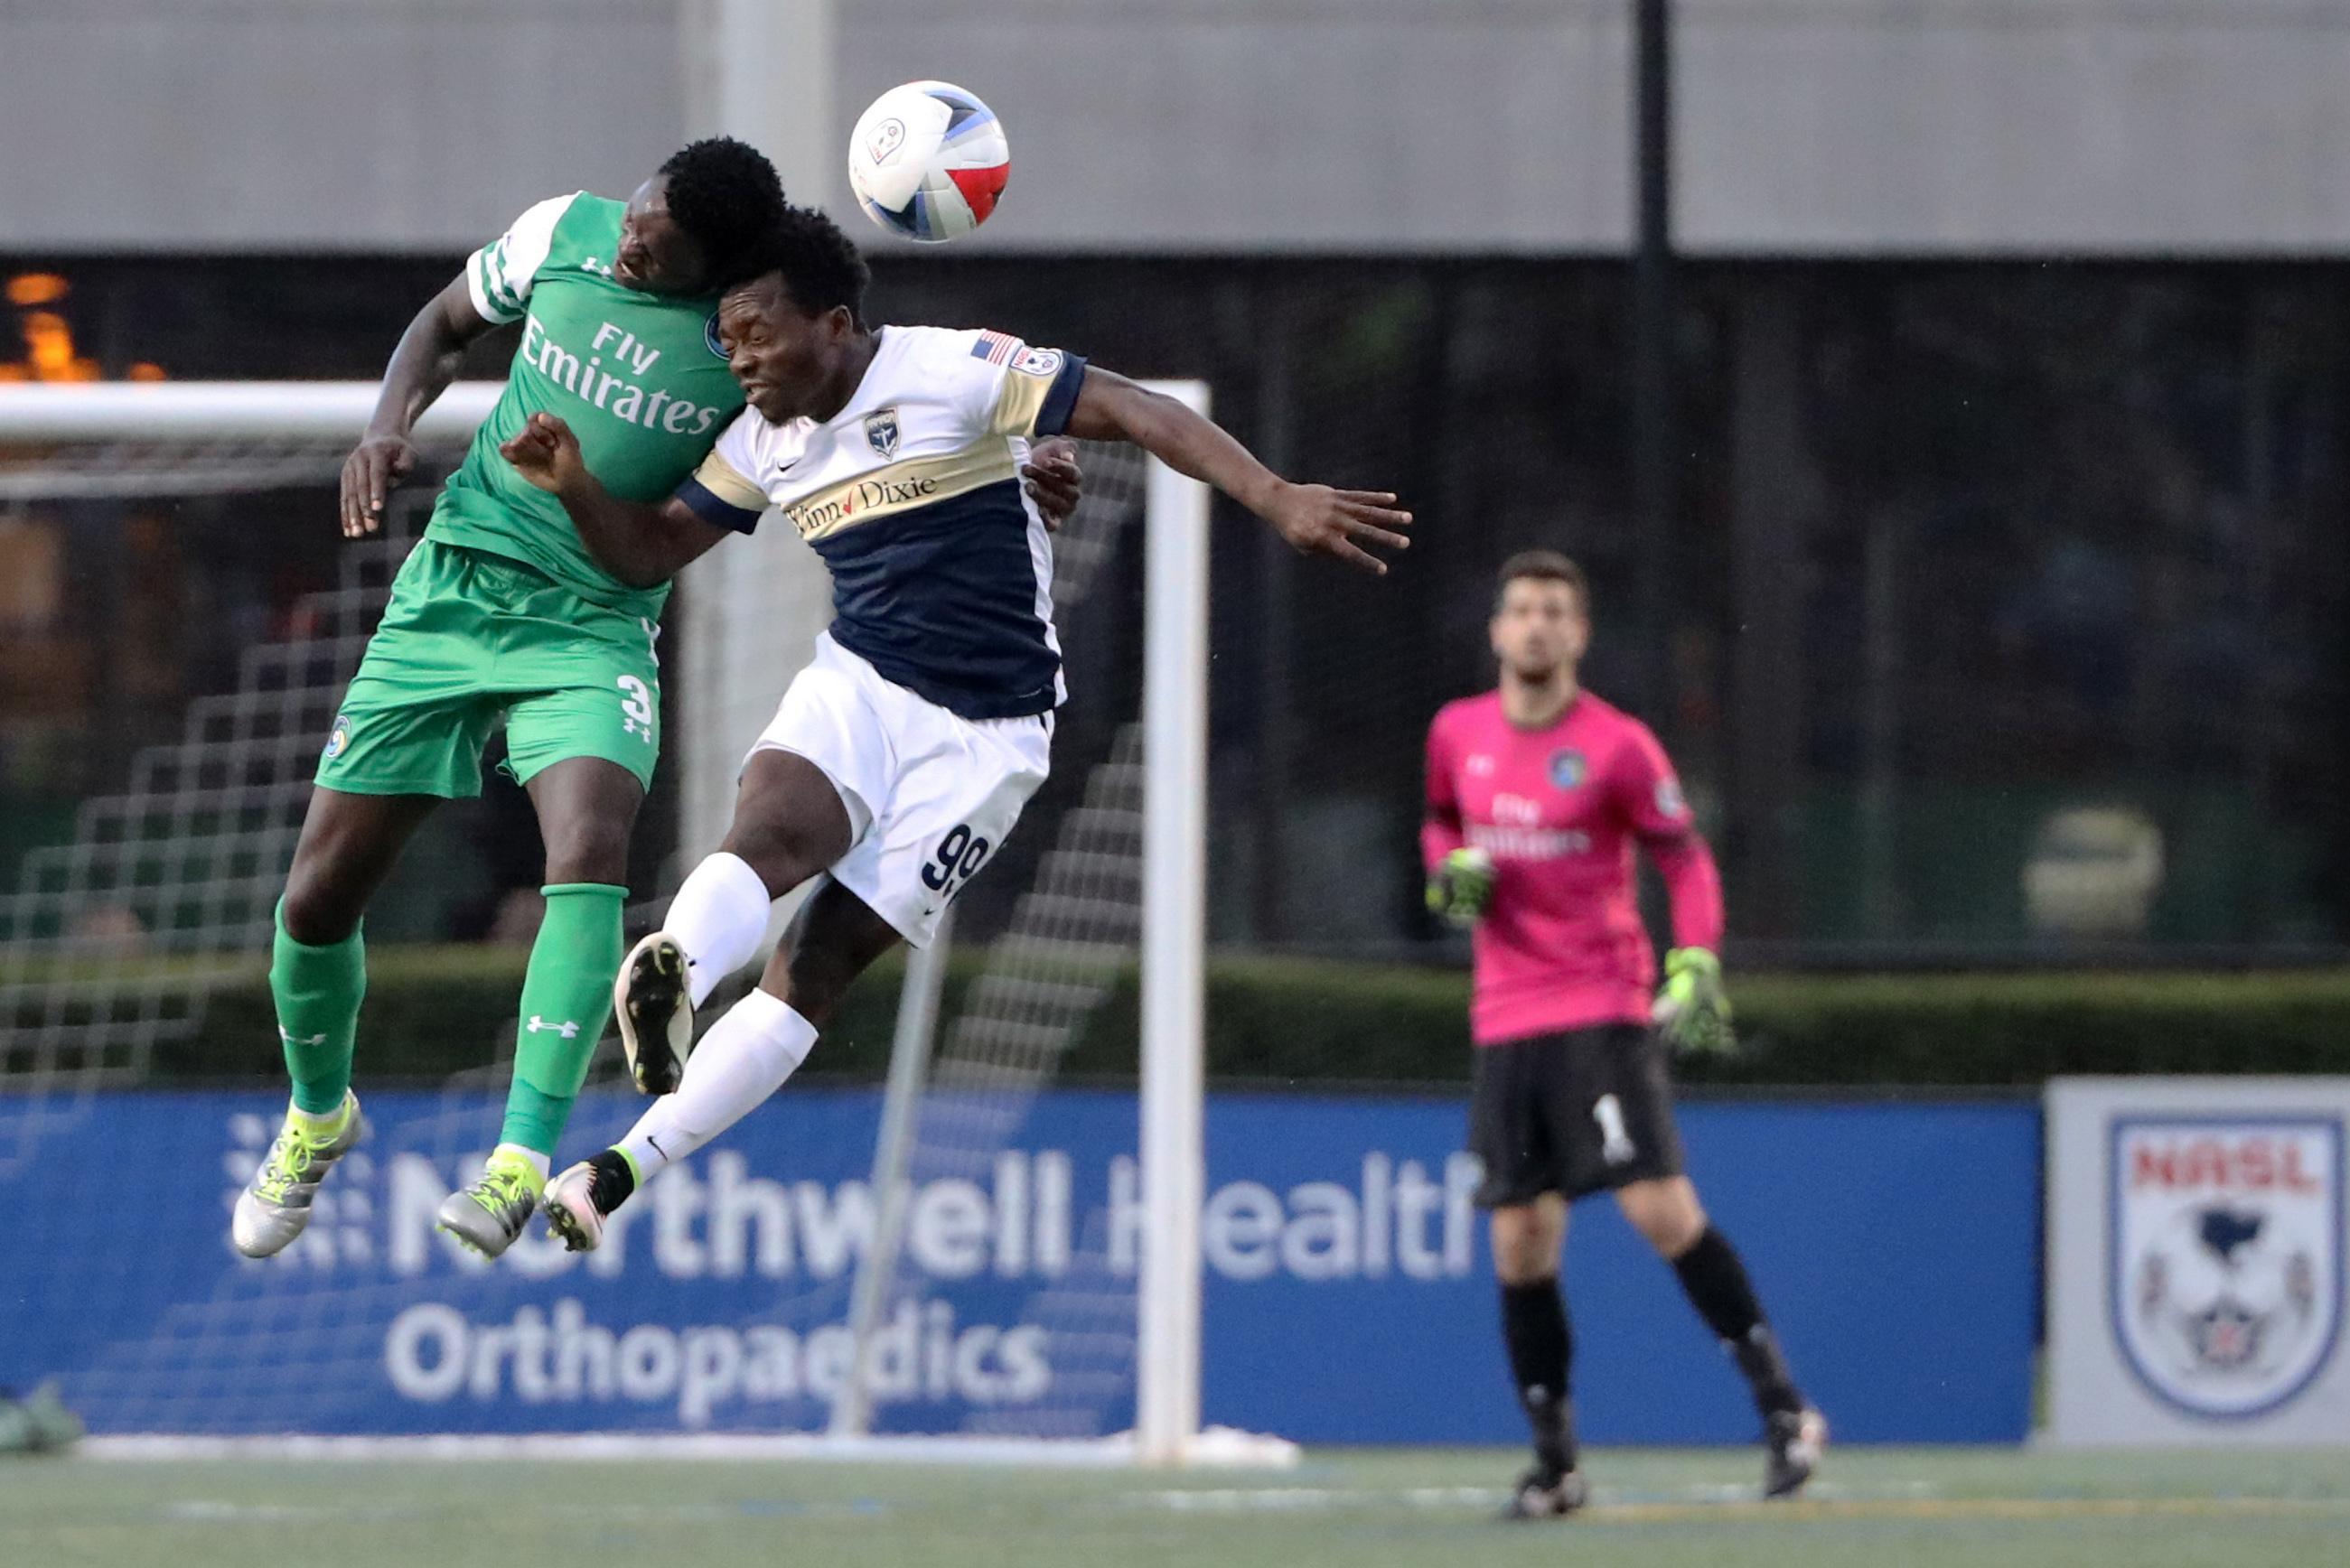 Soccer: Jacksonville Armada FC at New York Cosmos